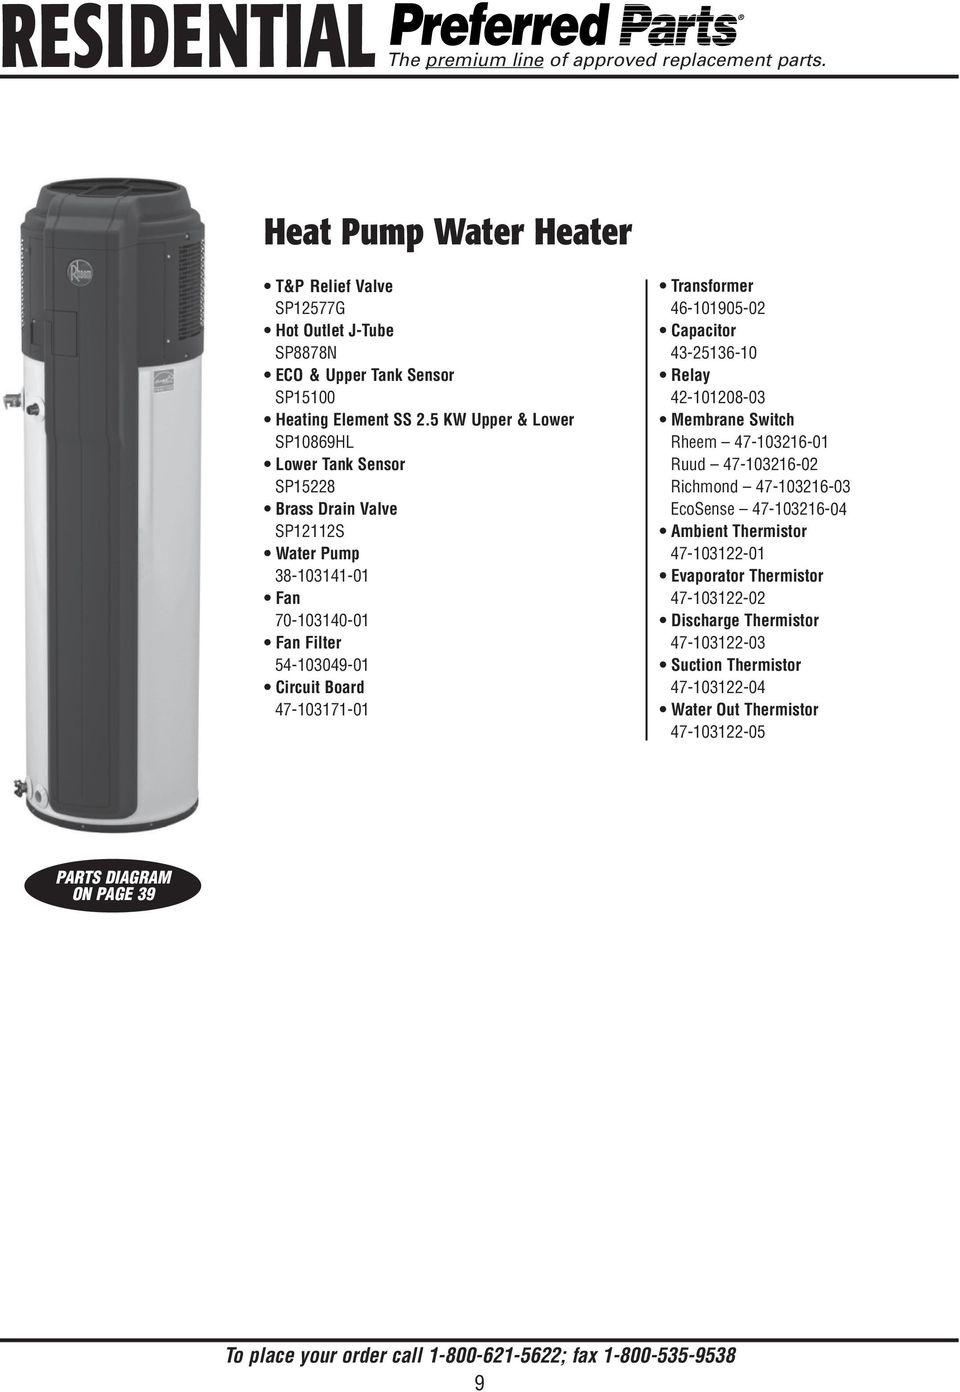 hight resolution of 5 kw upper lower sp10869hl lower tank sensor sp15228 brass drain valve sp12112s water pump